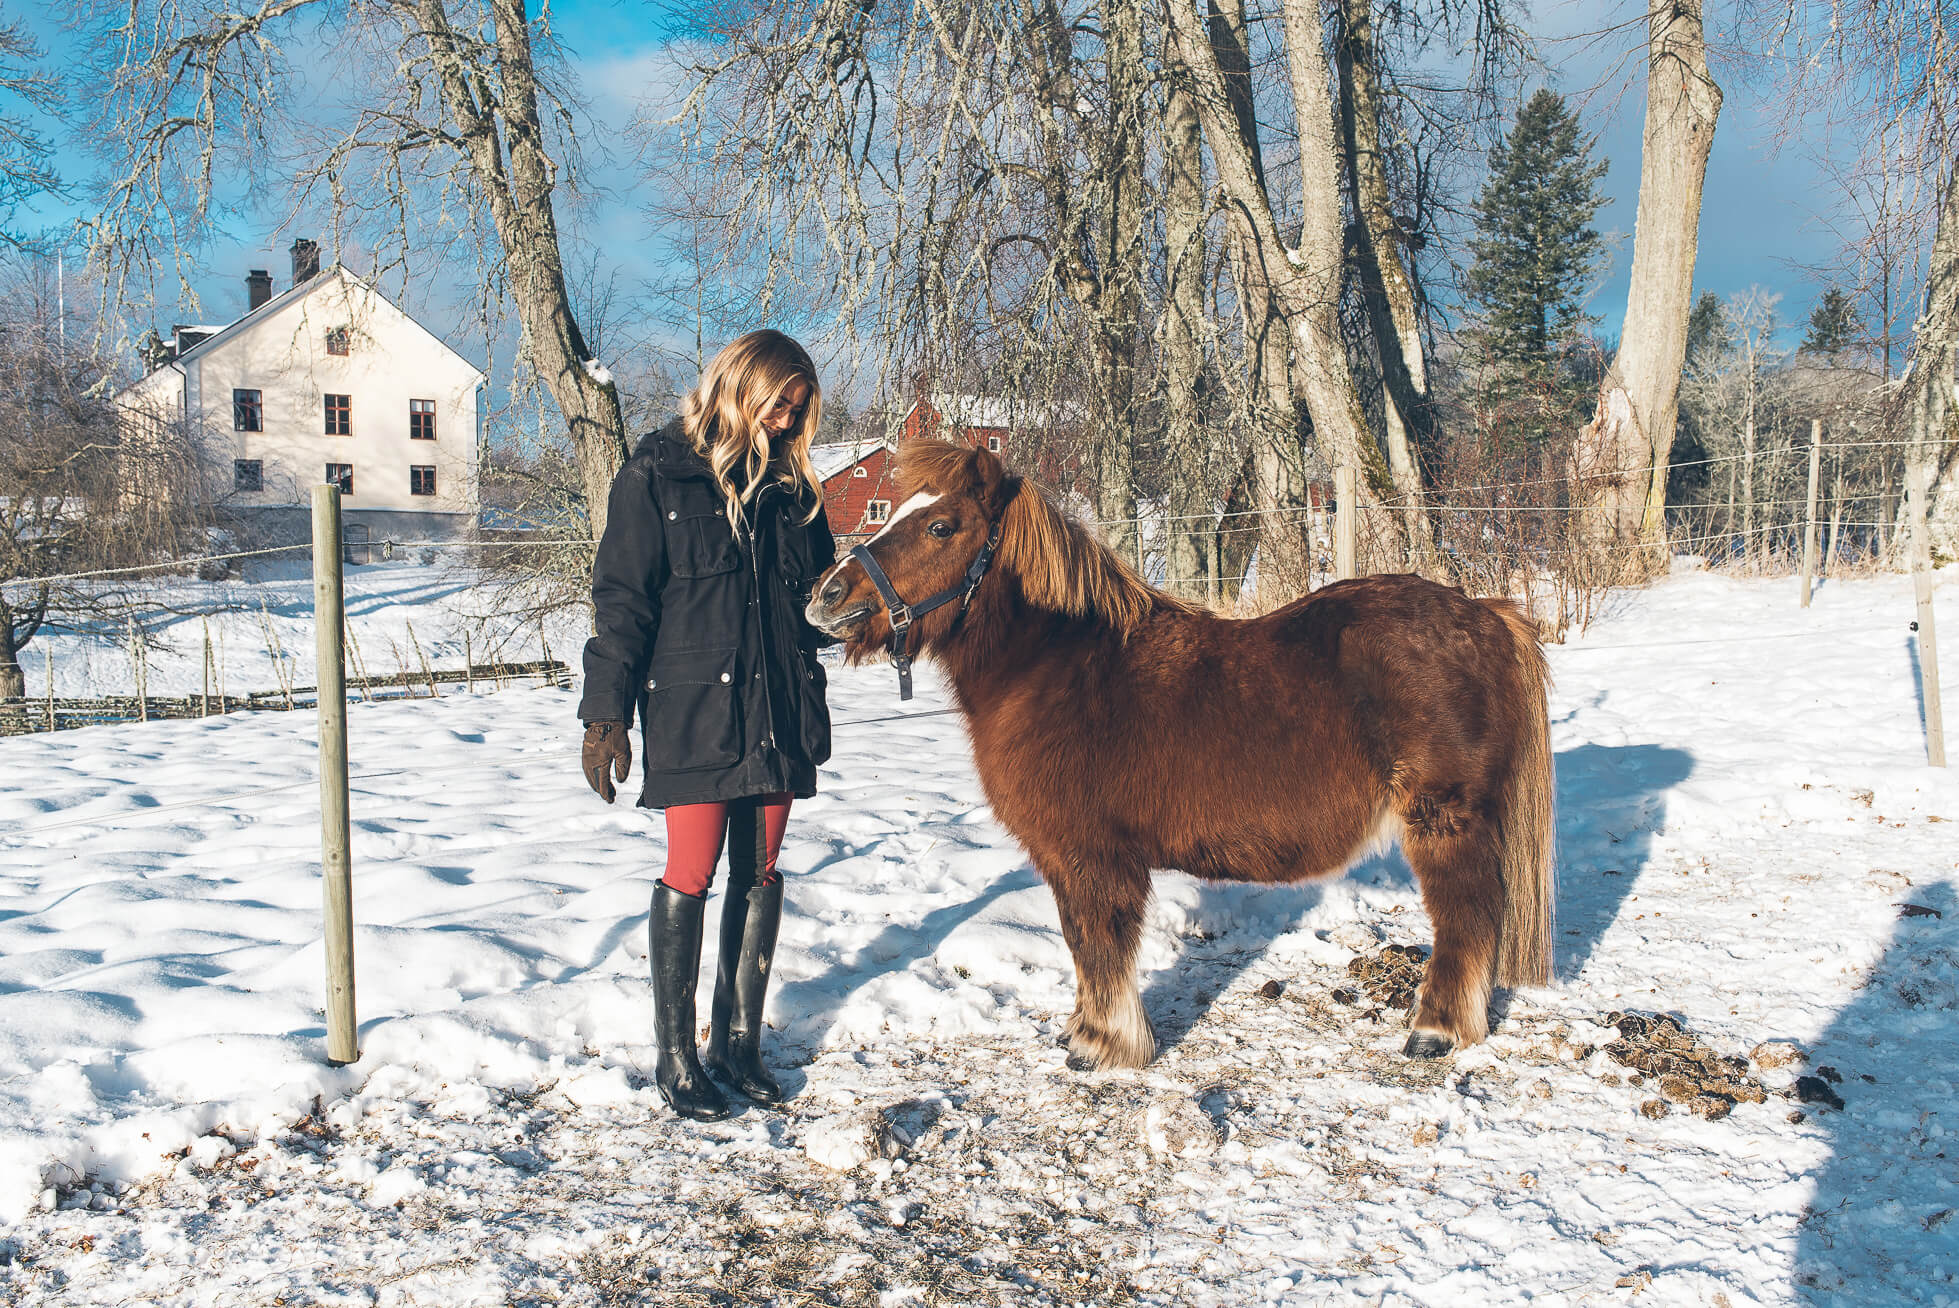 janni-deler-horses-snowDSC_6492